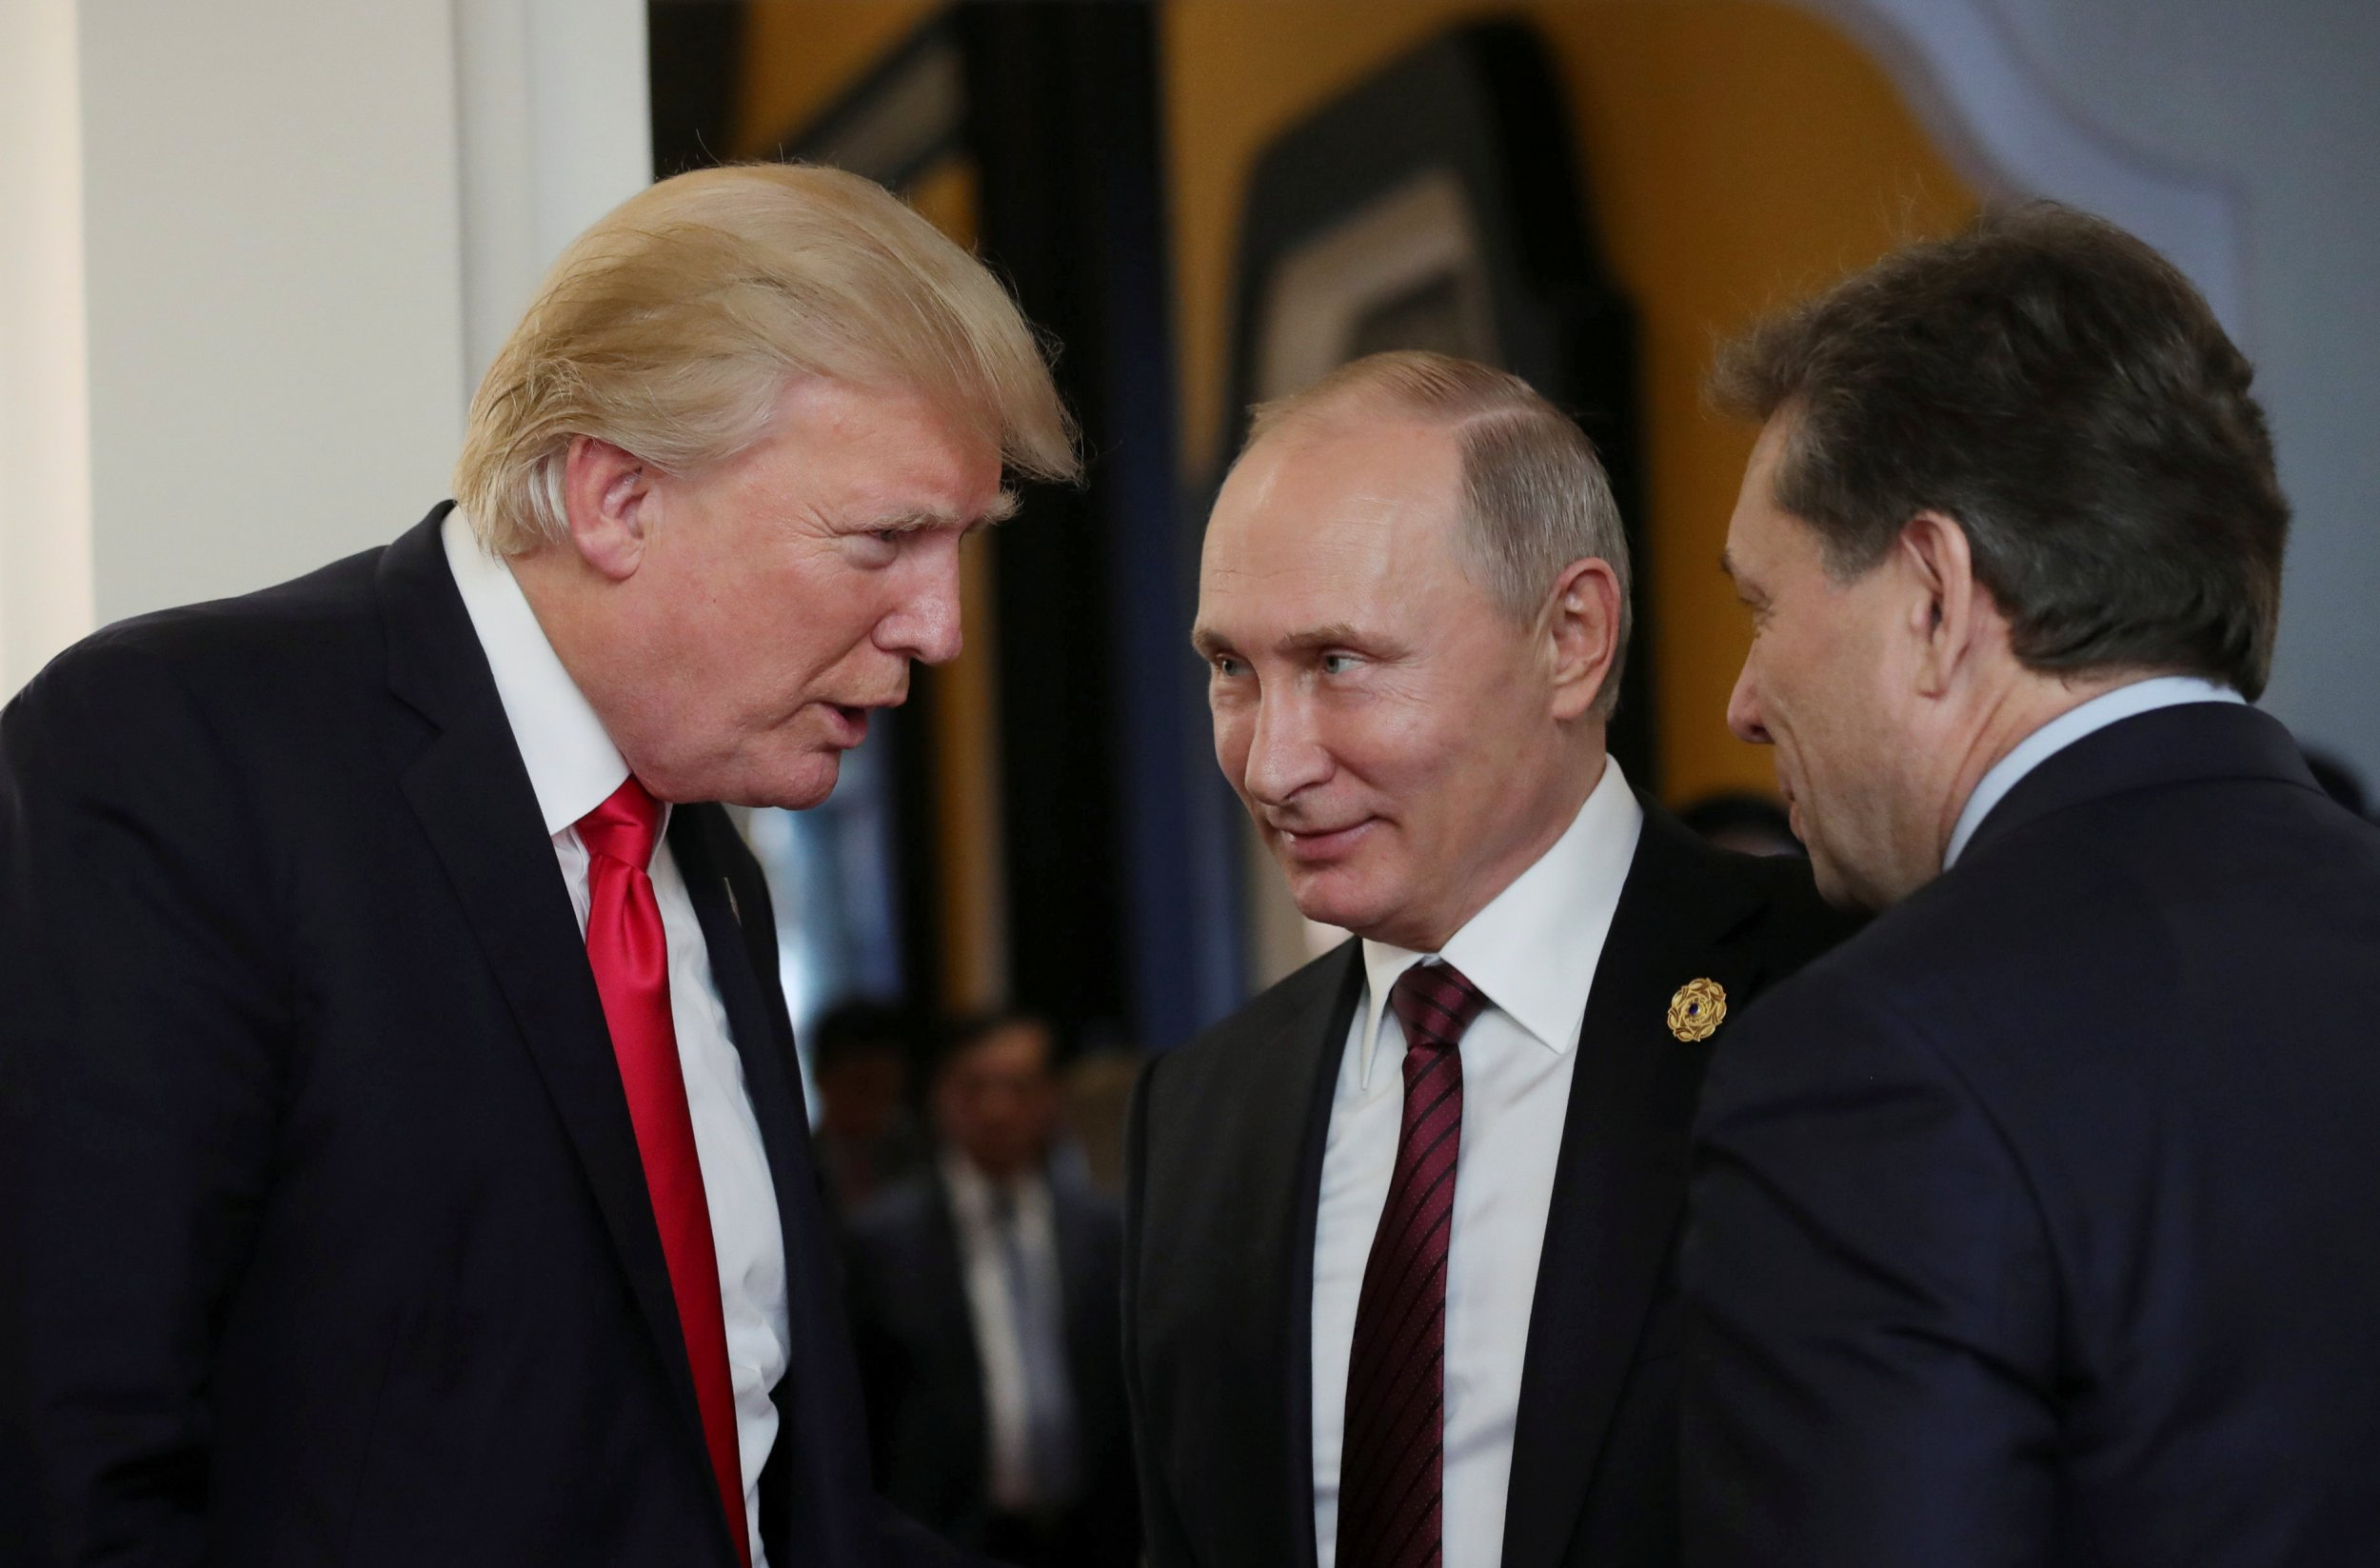 '11_13_Trump_Putin' from the web at 'http://s.newsweek.com/sites/www.newsweek.com/files/styles/thumbnail/public/2017/11/13/1113trumpputin.jpg'